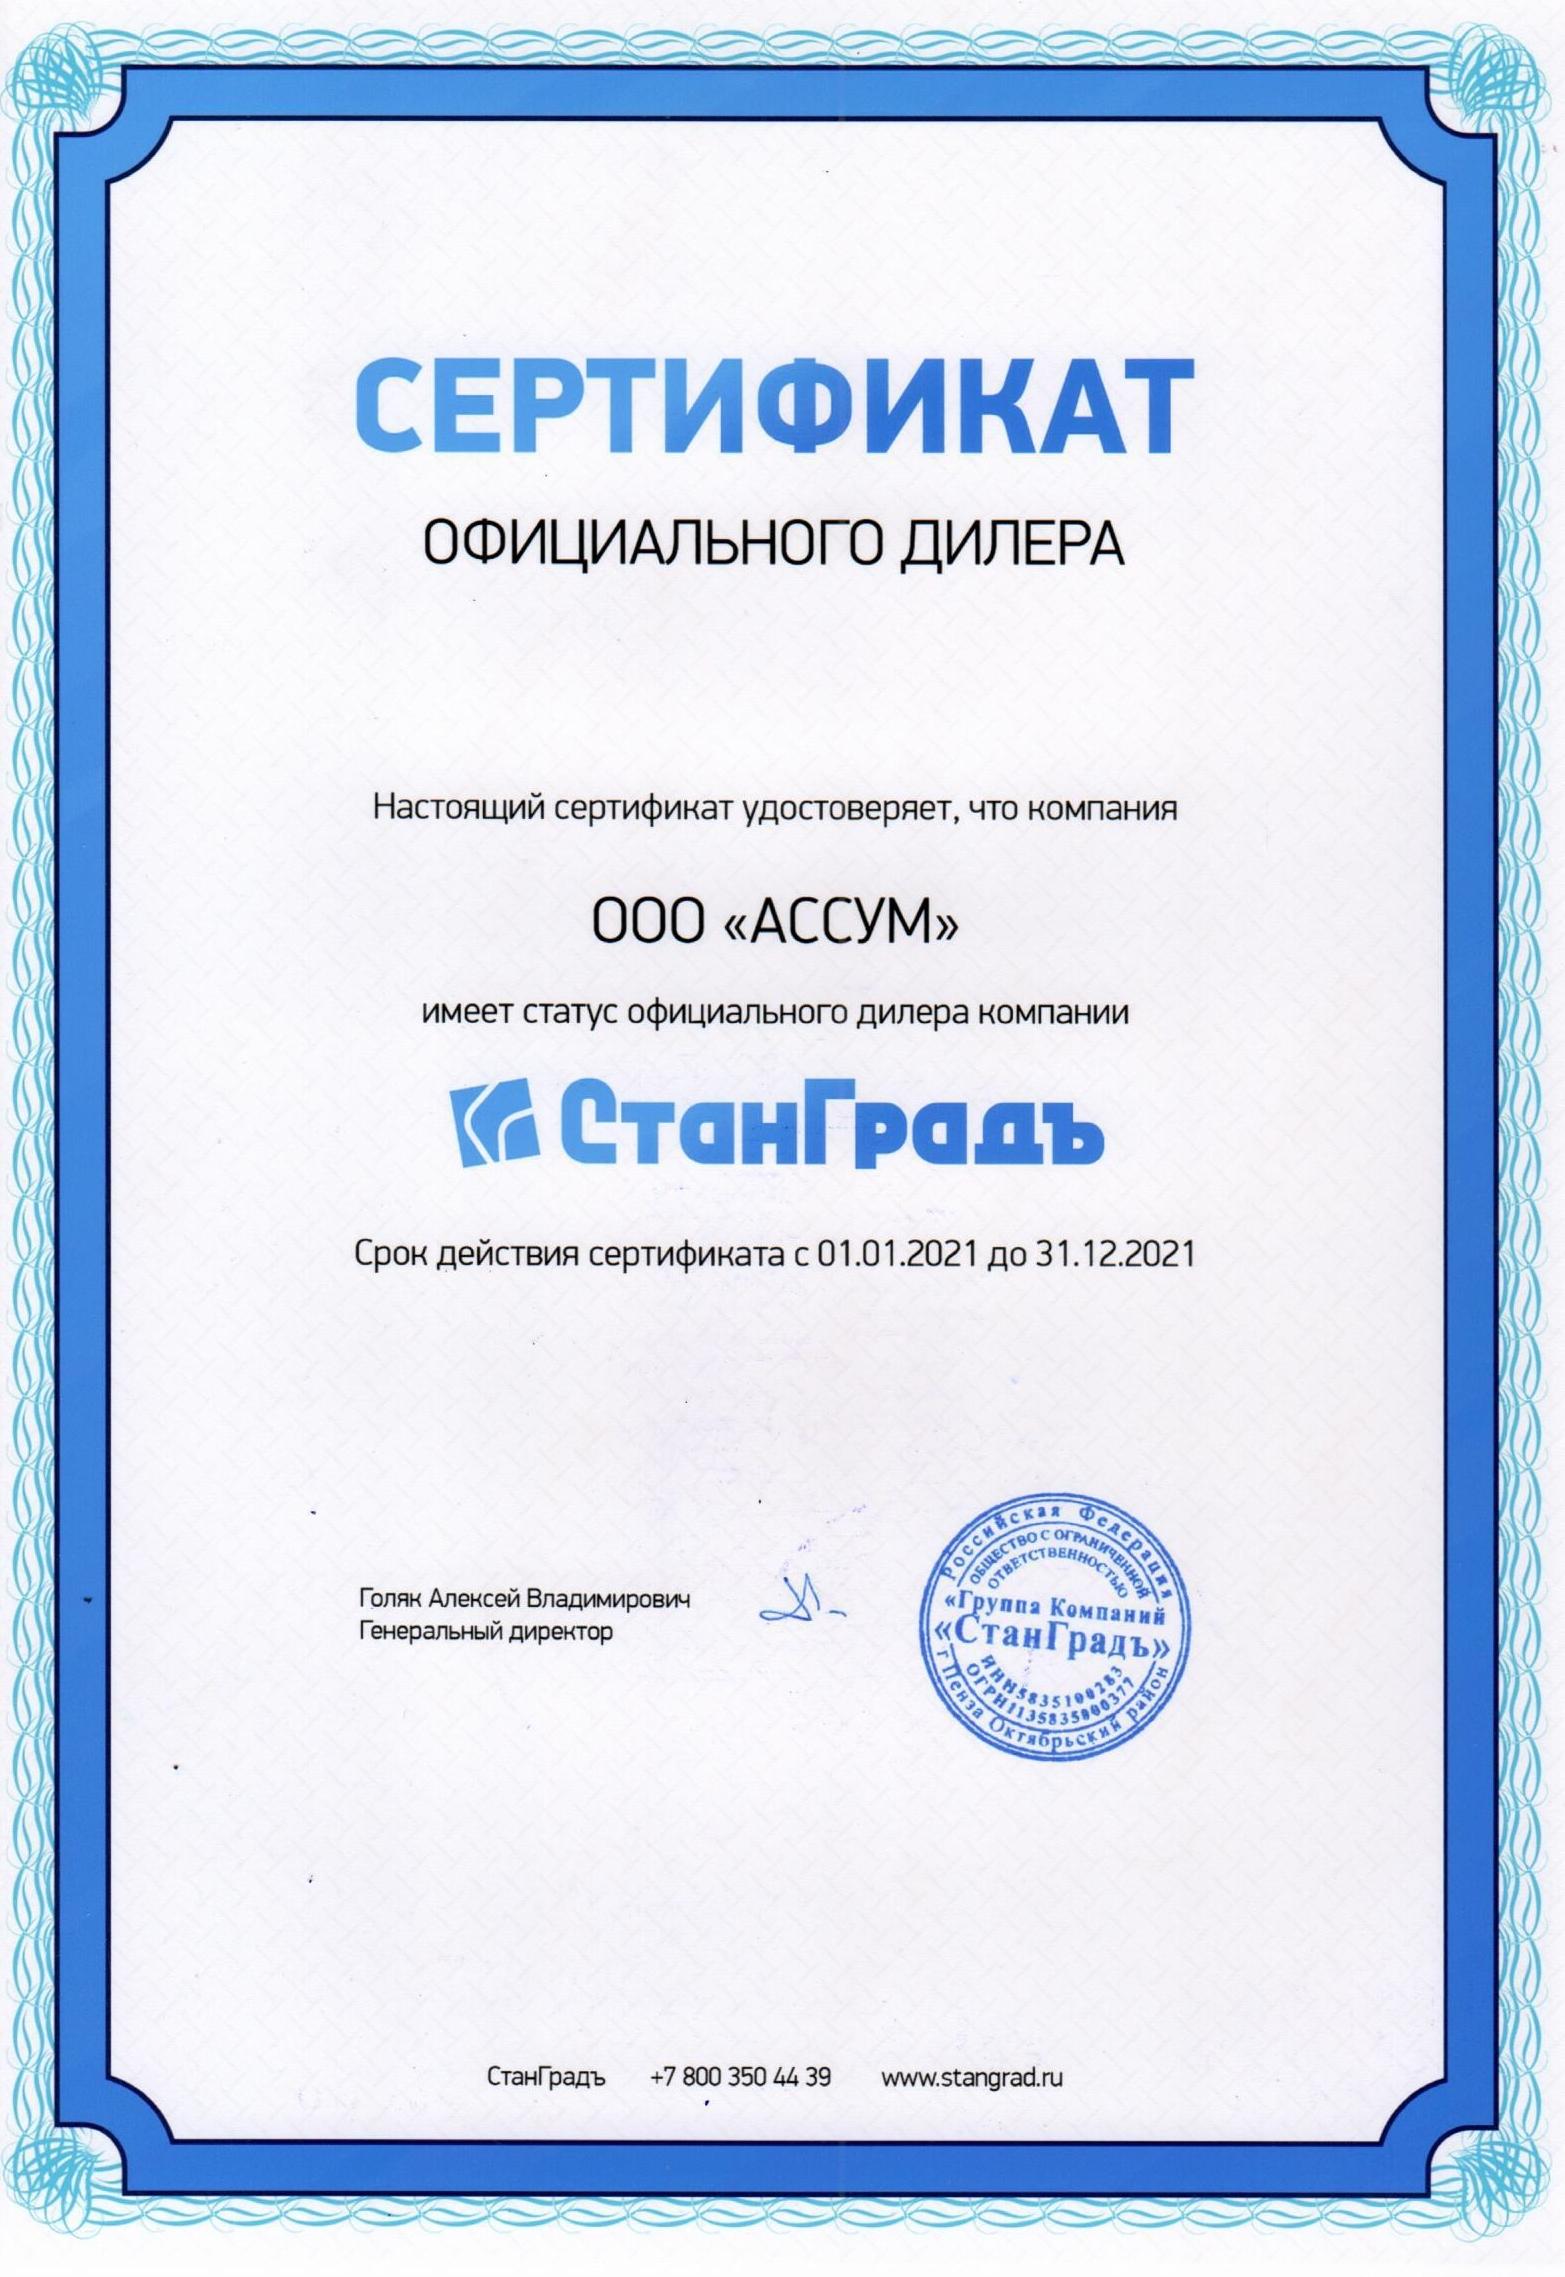 Сертификат Станградъ